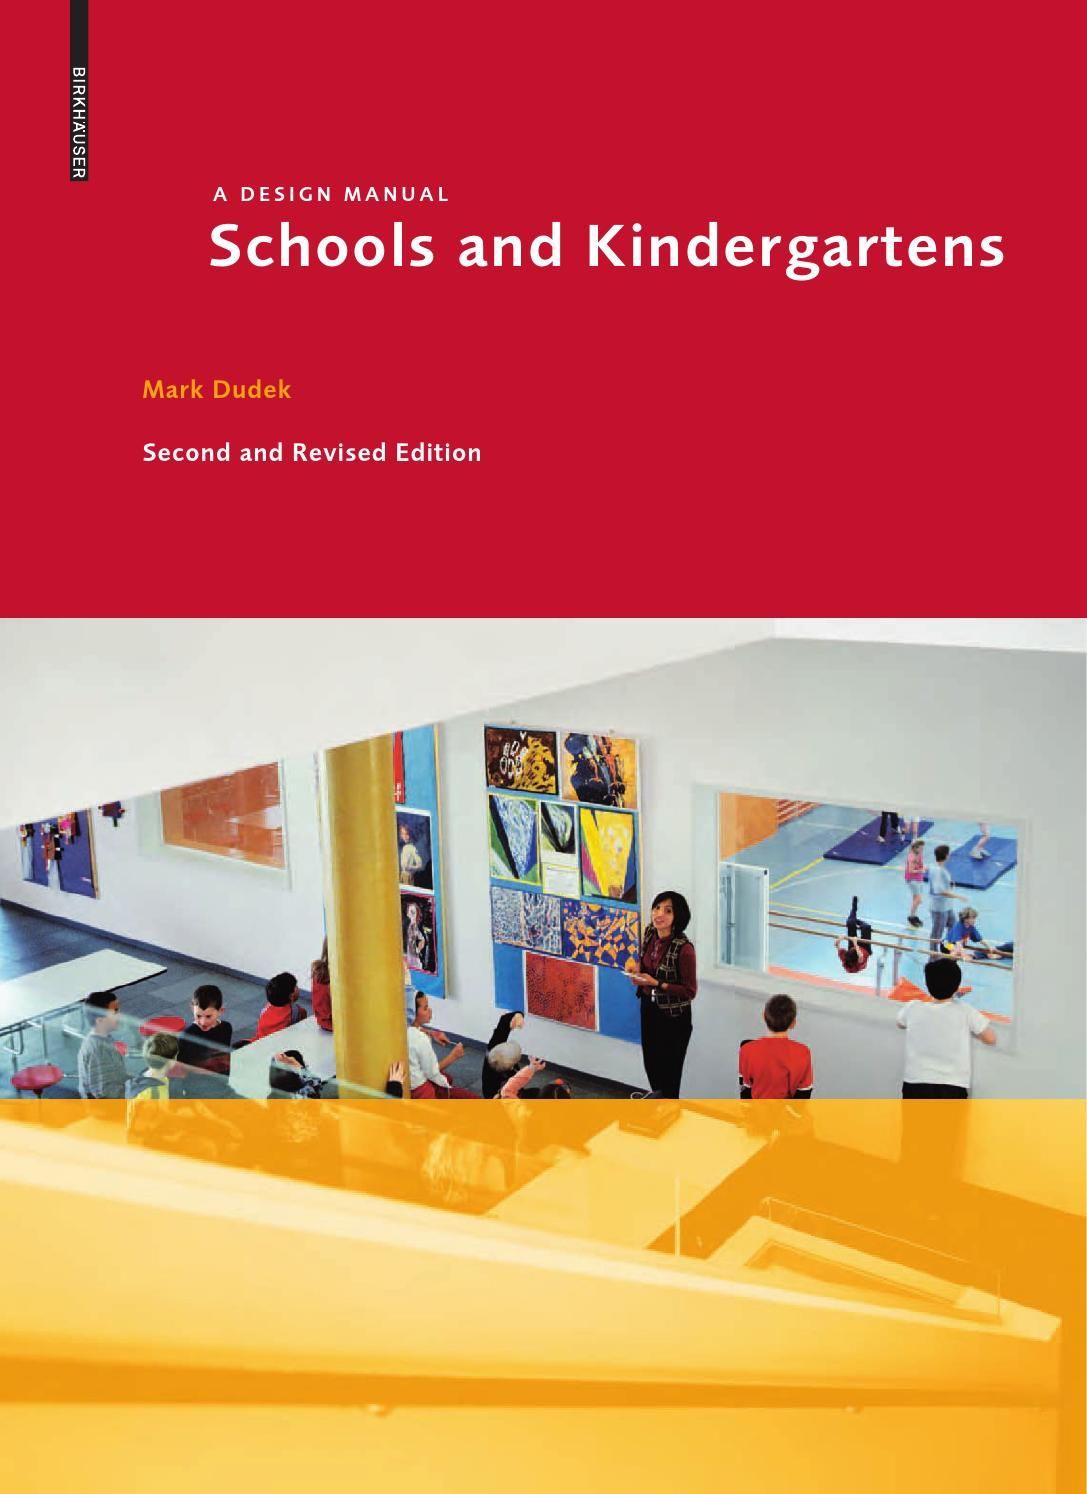 Schools and kindergartens a design manual by Birkhäuser - issuu